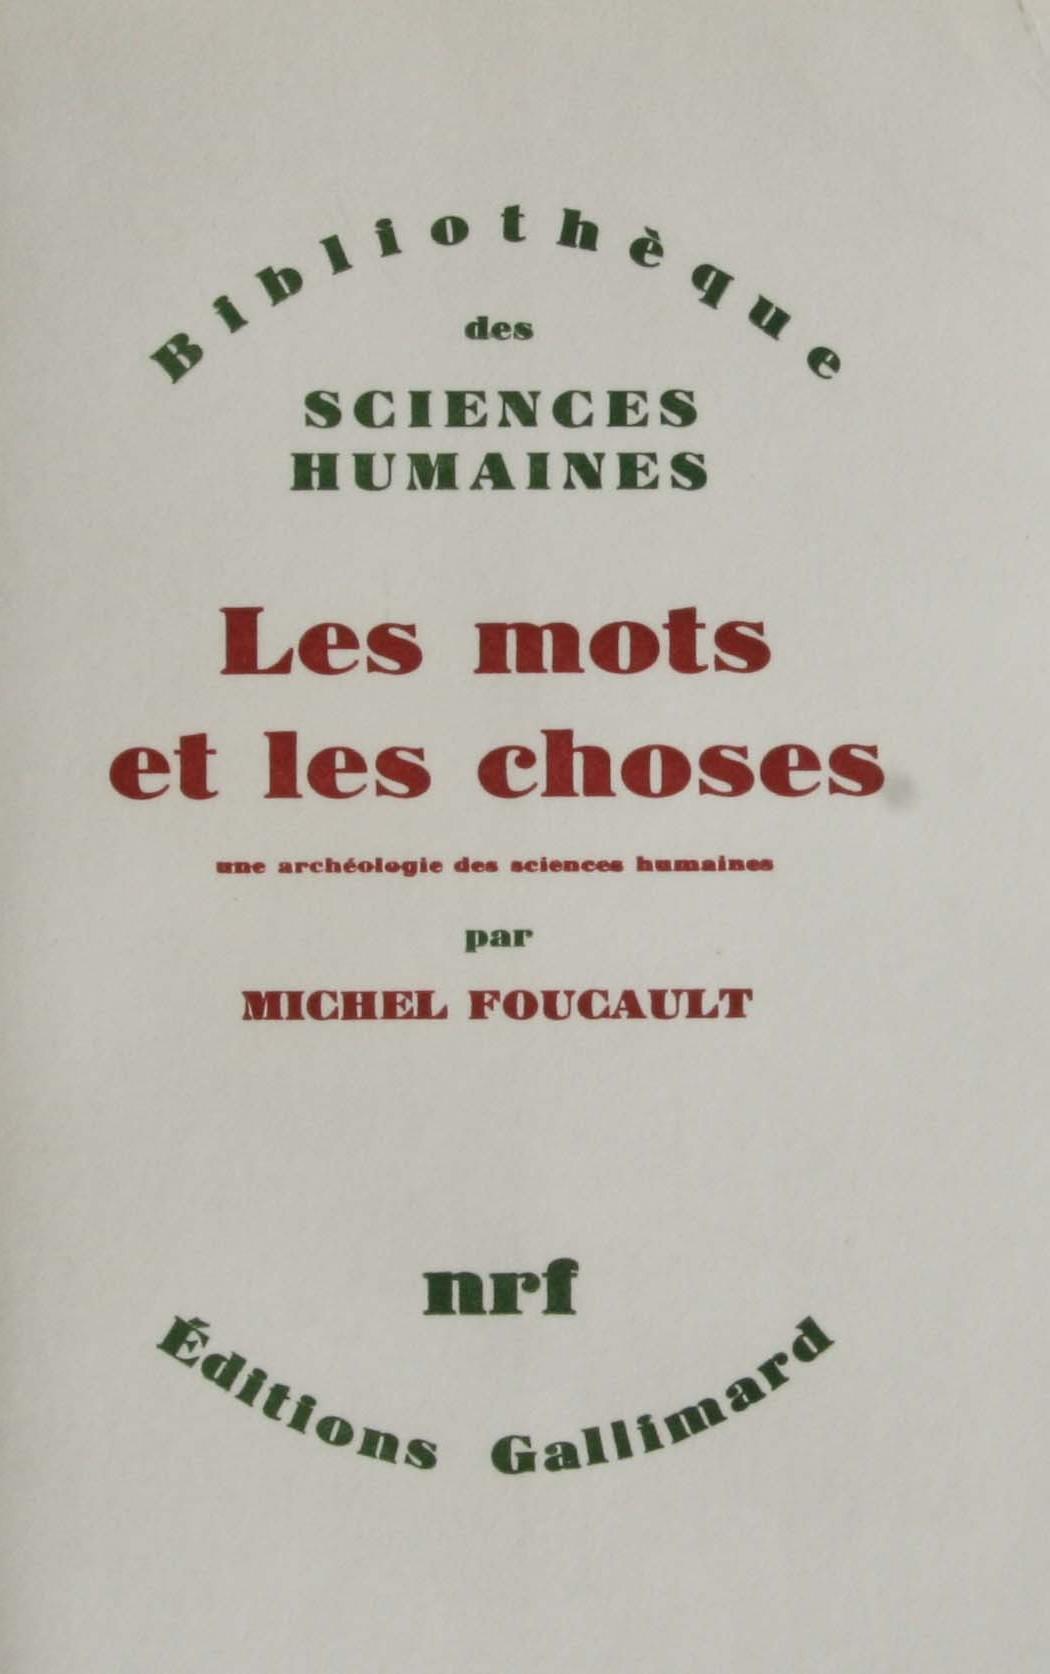 Michel Foucault first edition